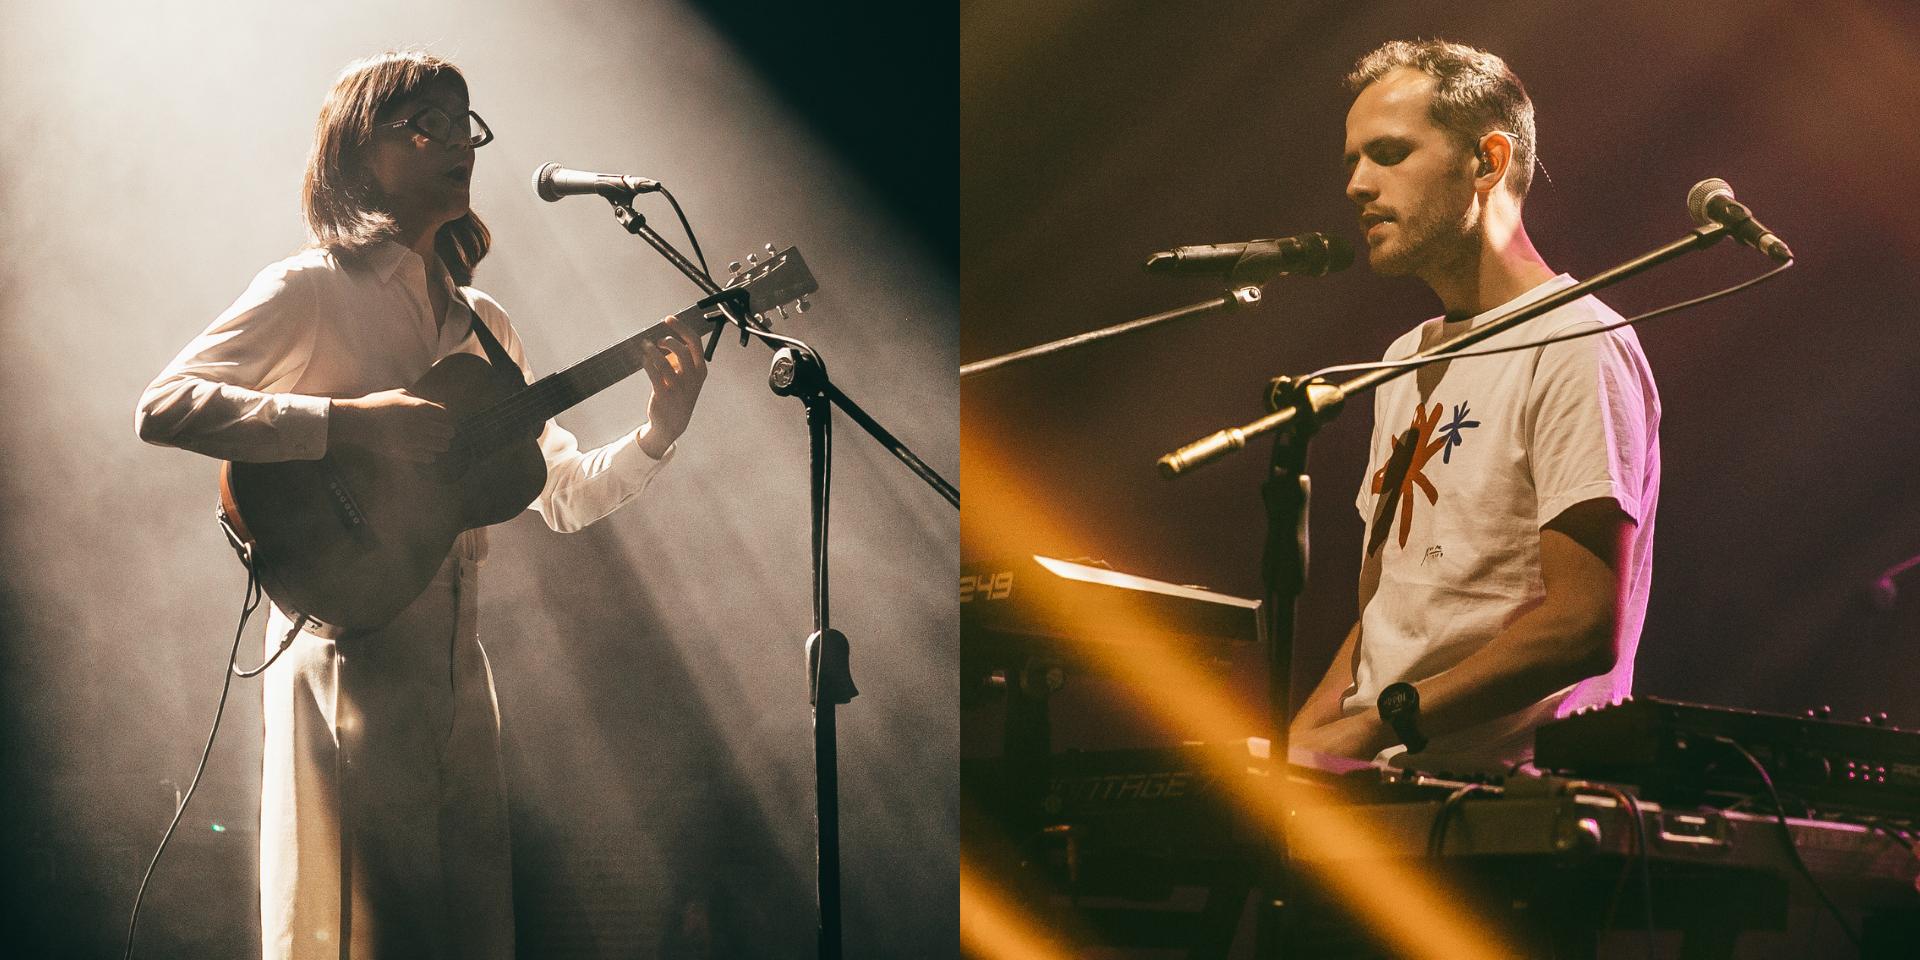 Unique, Jordan Rakei make Karpos Live Mix 6 a spellbinding affair – photo gallery